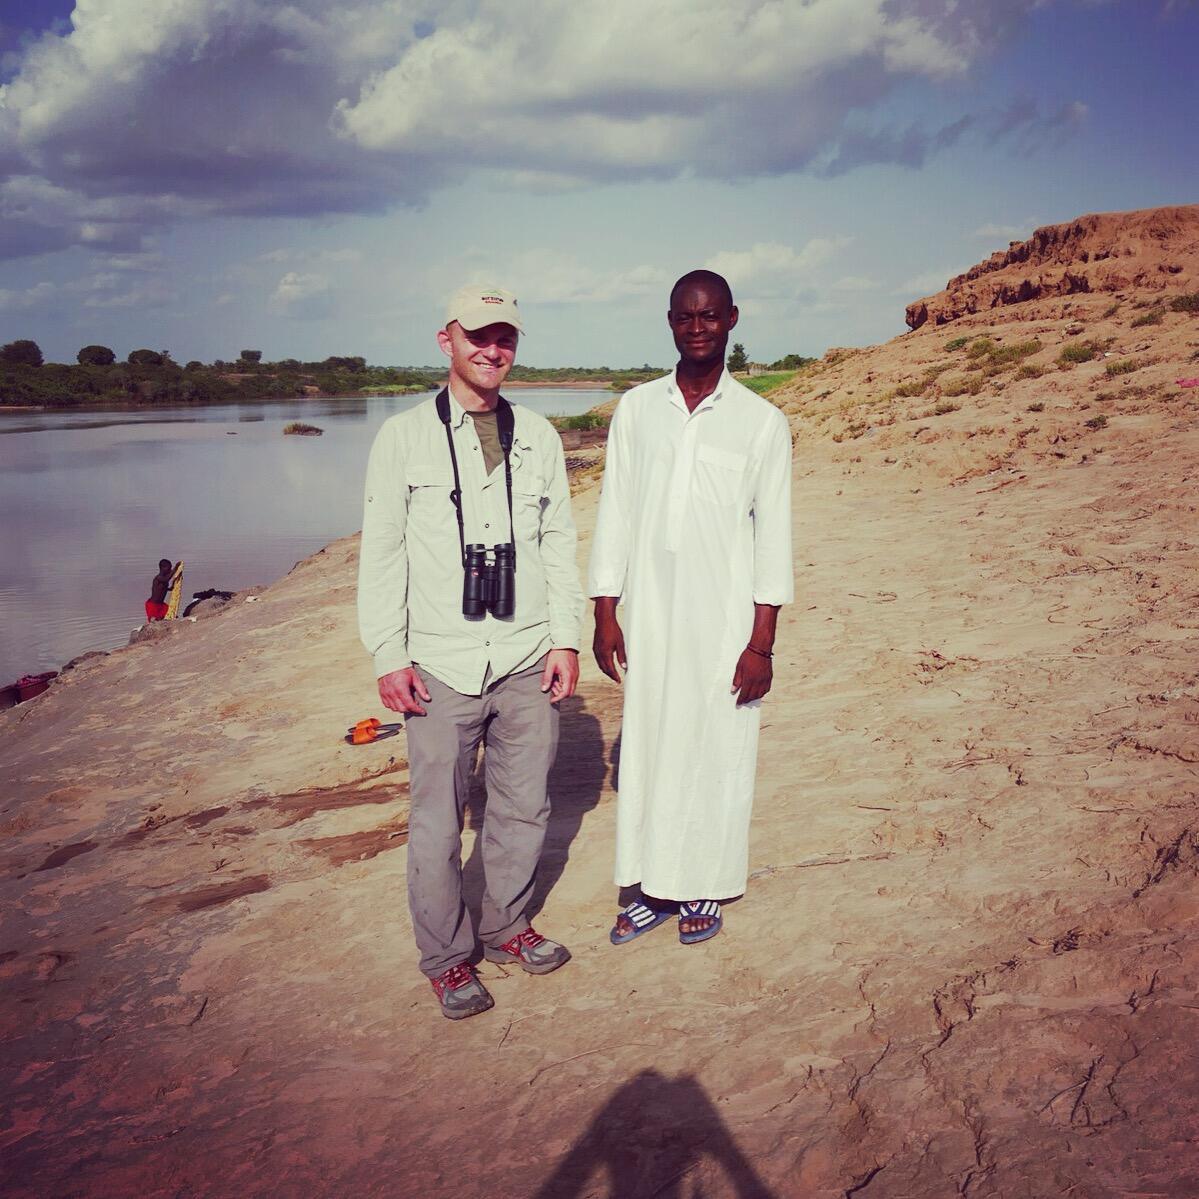 Noah with a friend in northern Ghana. Noah Strycker